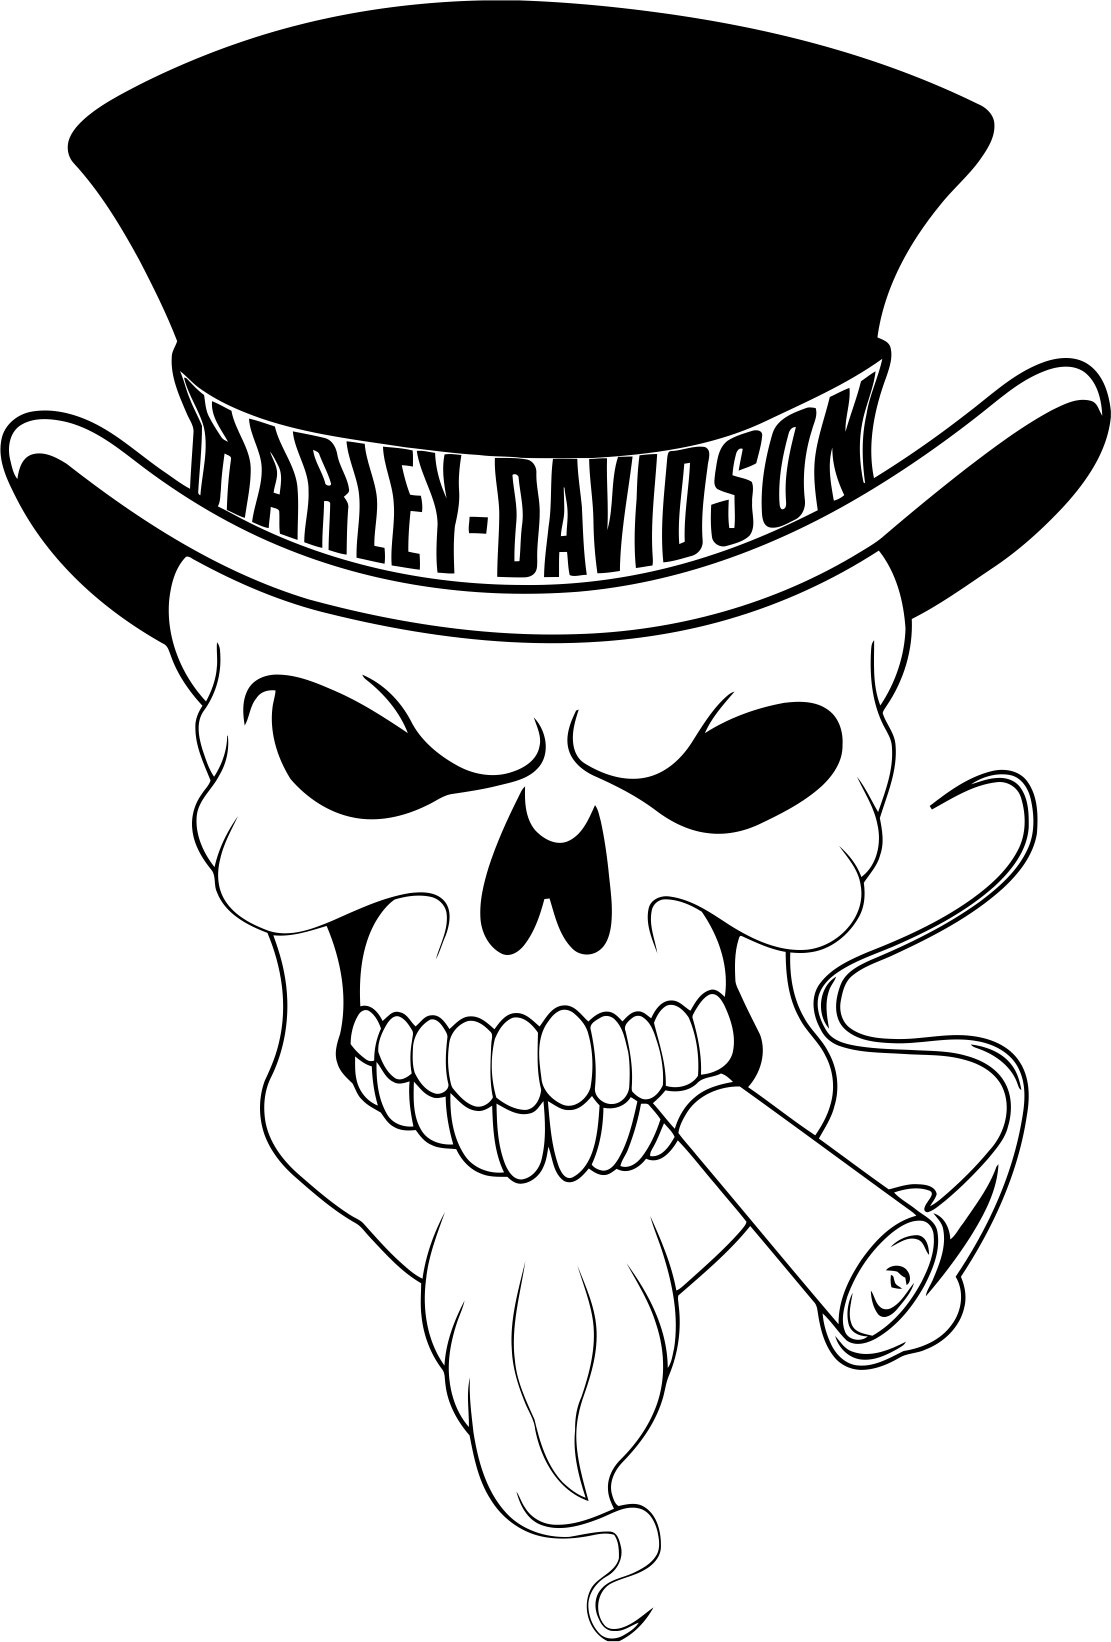 Harley-Davidson Stencil EPS File